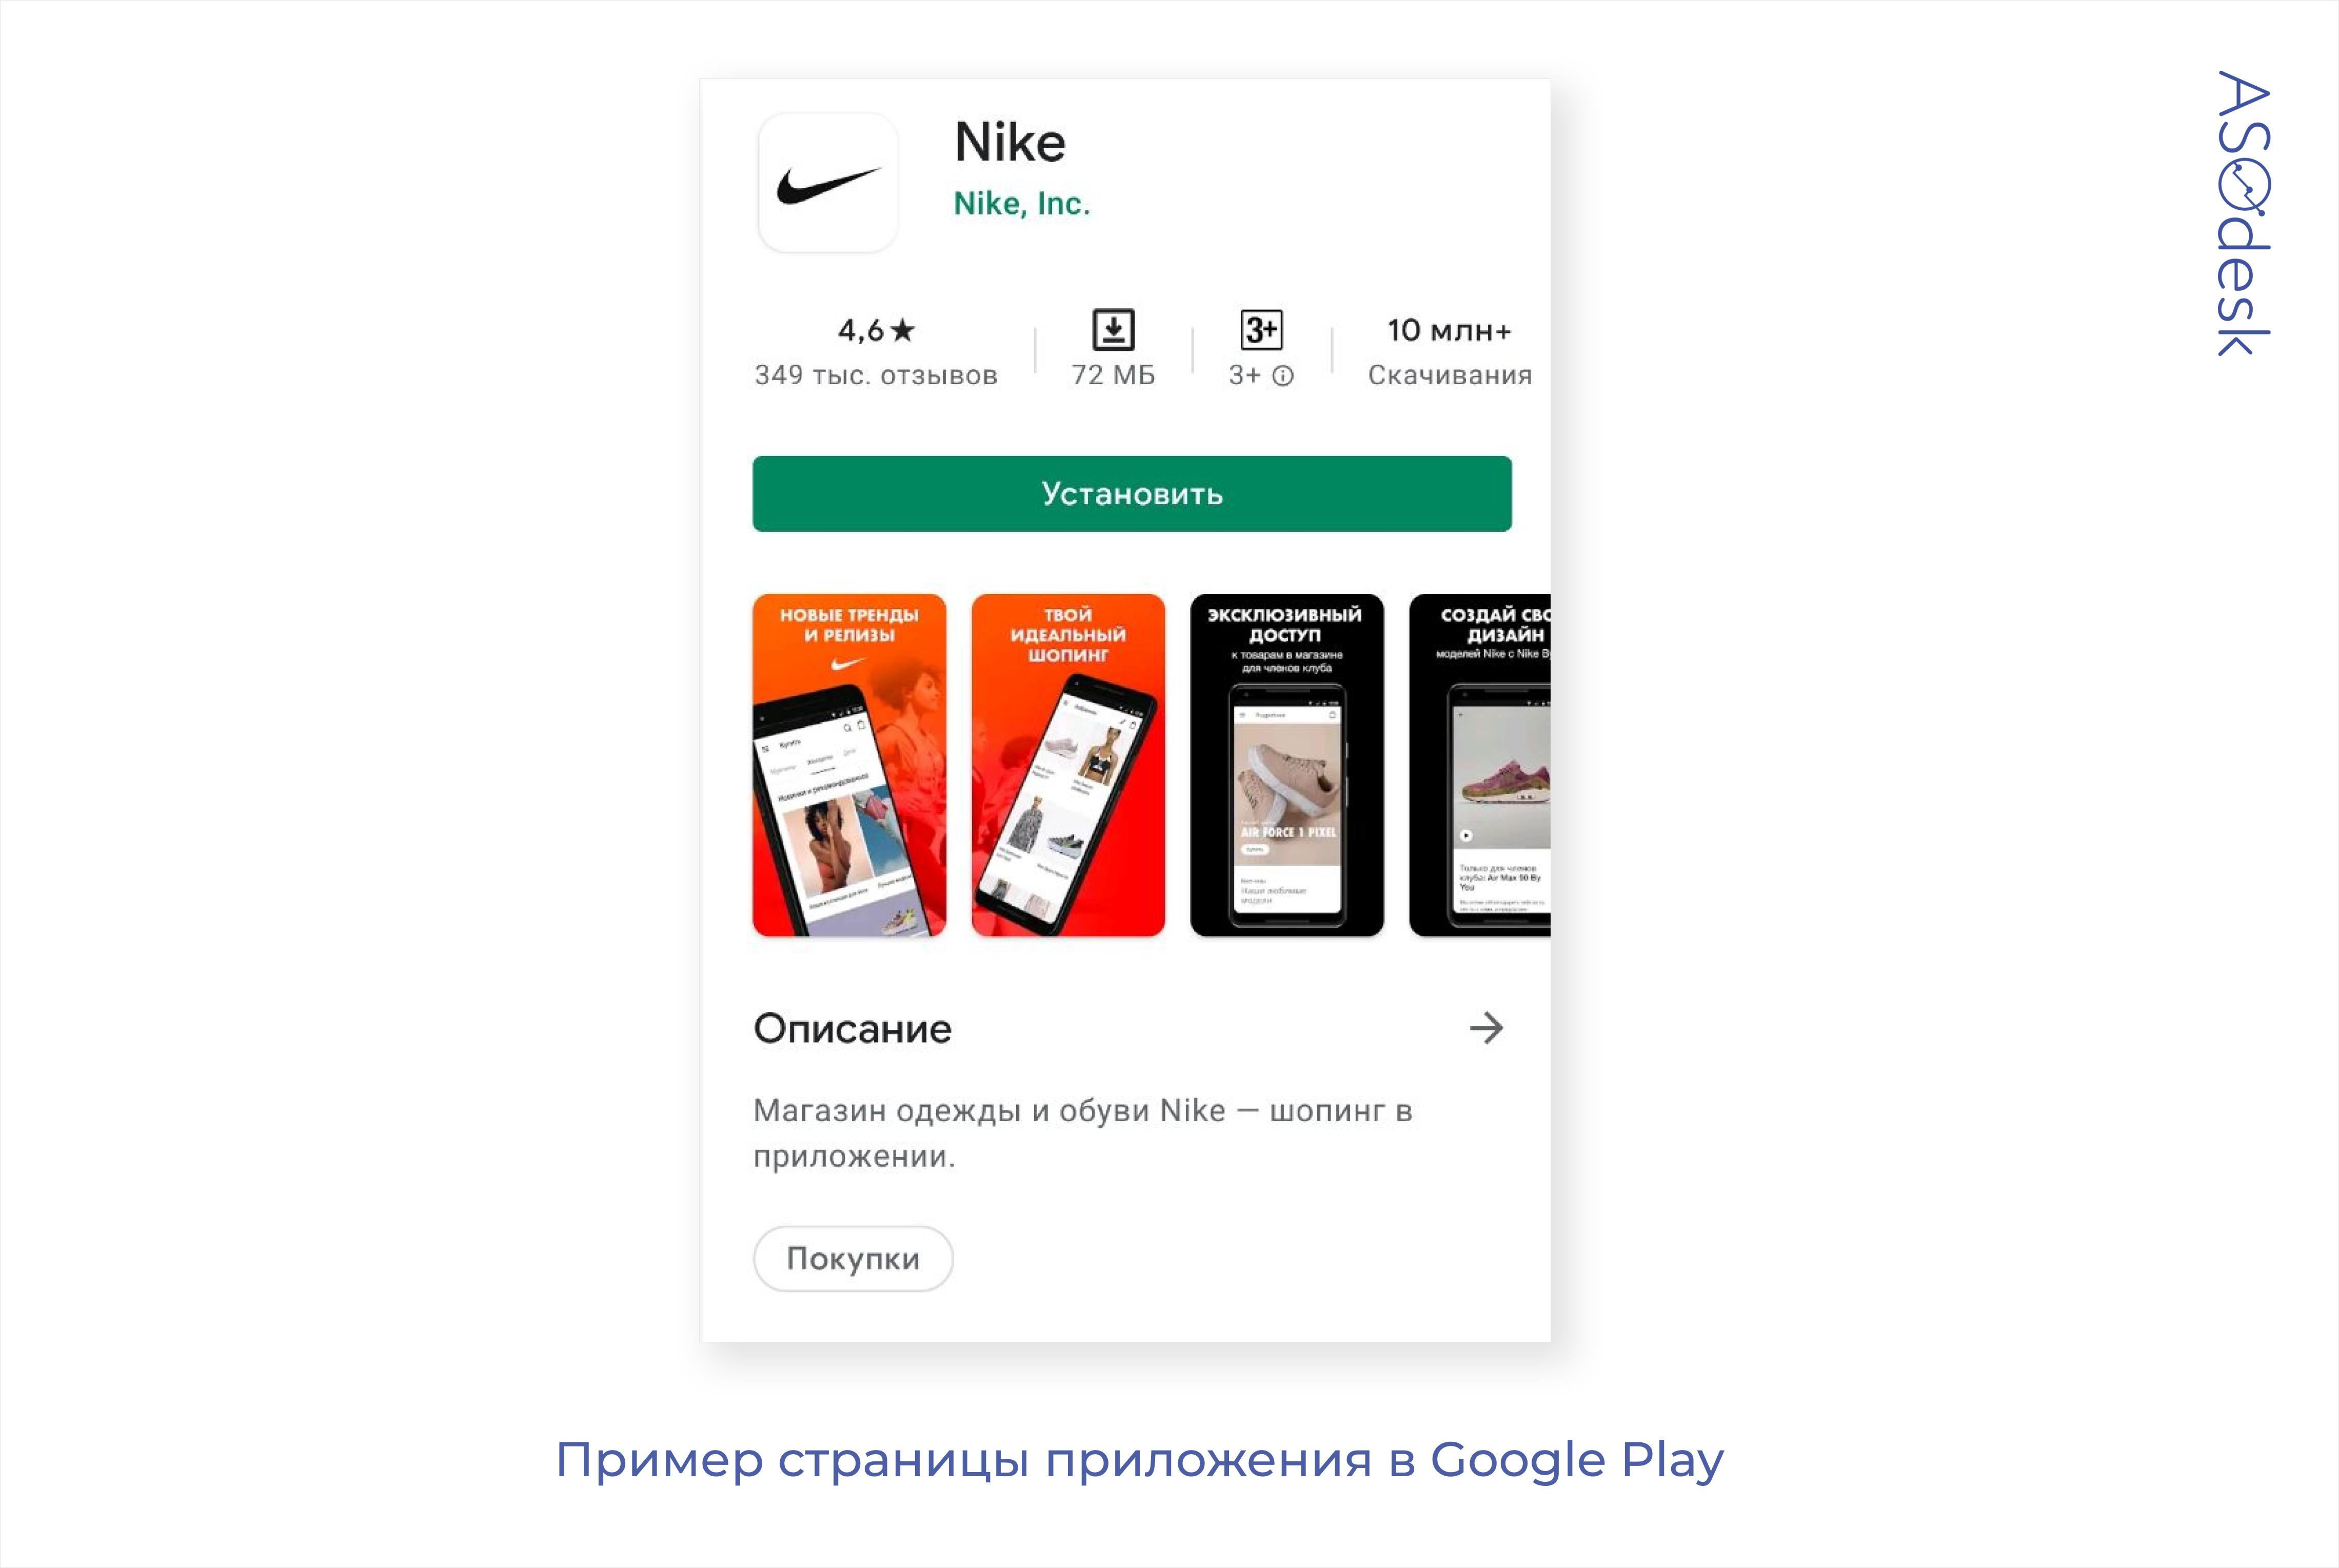 Страница приложения Nike в Google Play